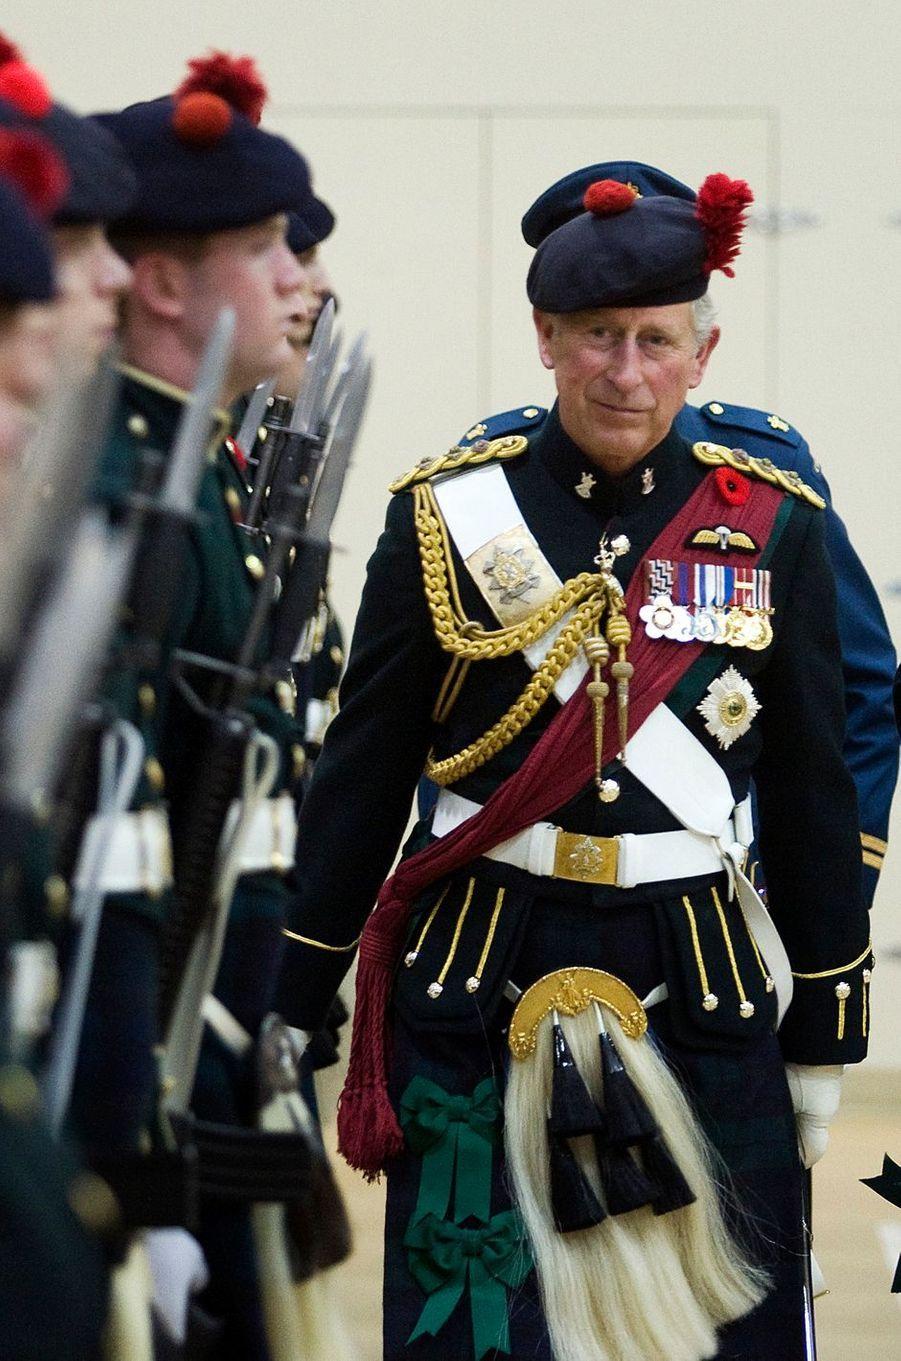 Le prince Charles à Montreal, le 10 novembre 2009